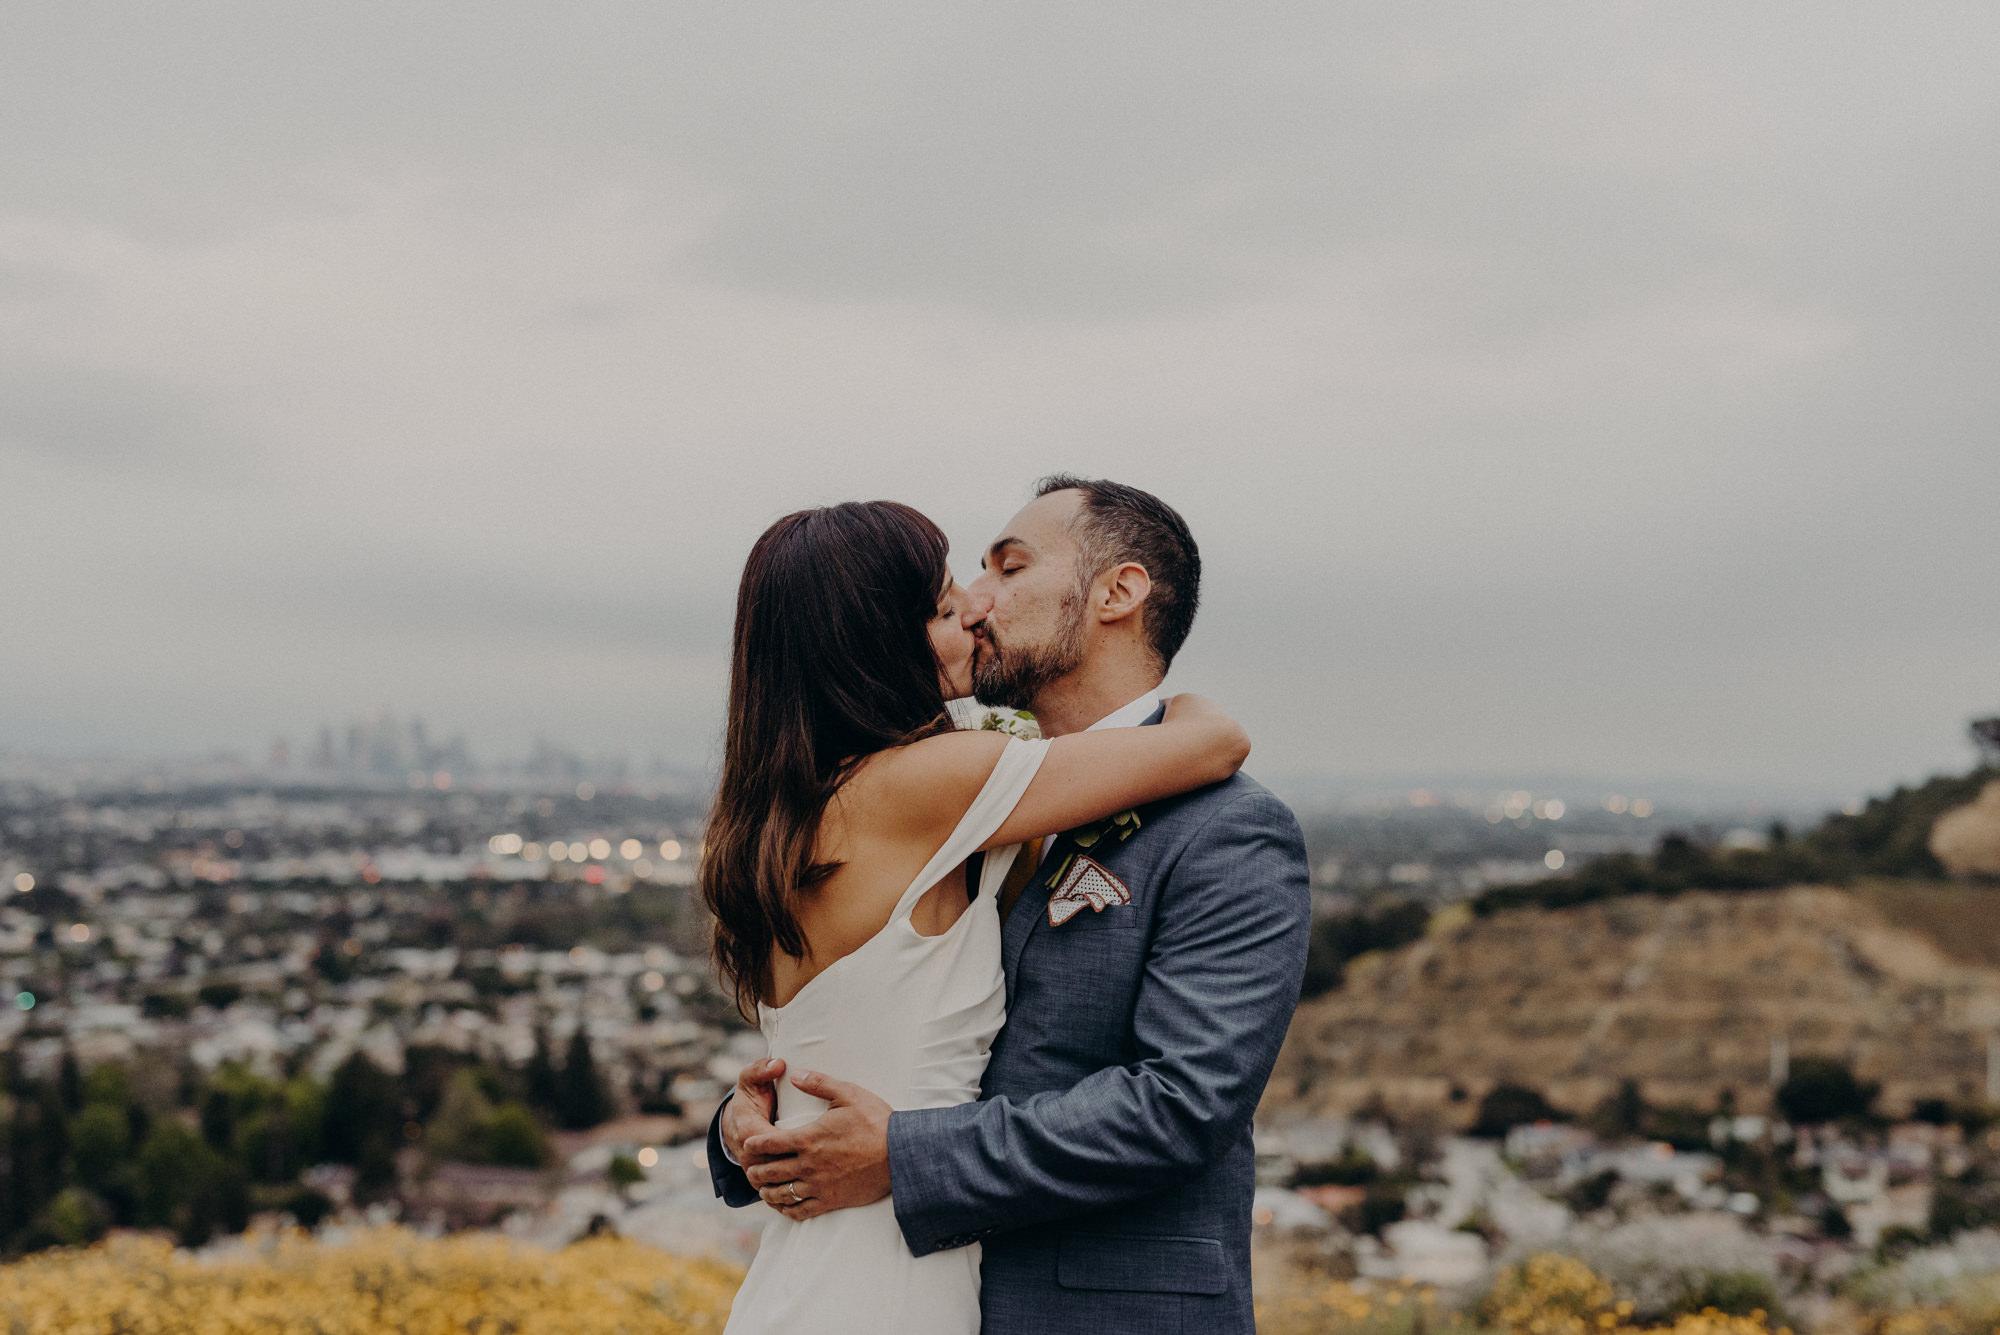 elopement photographer in los angeles - la wedding photographer - isaiahandtaylor.com-077.jpg